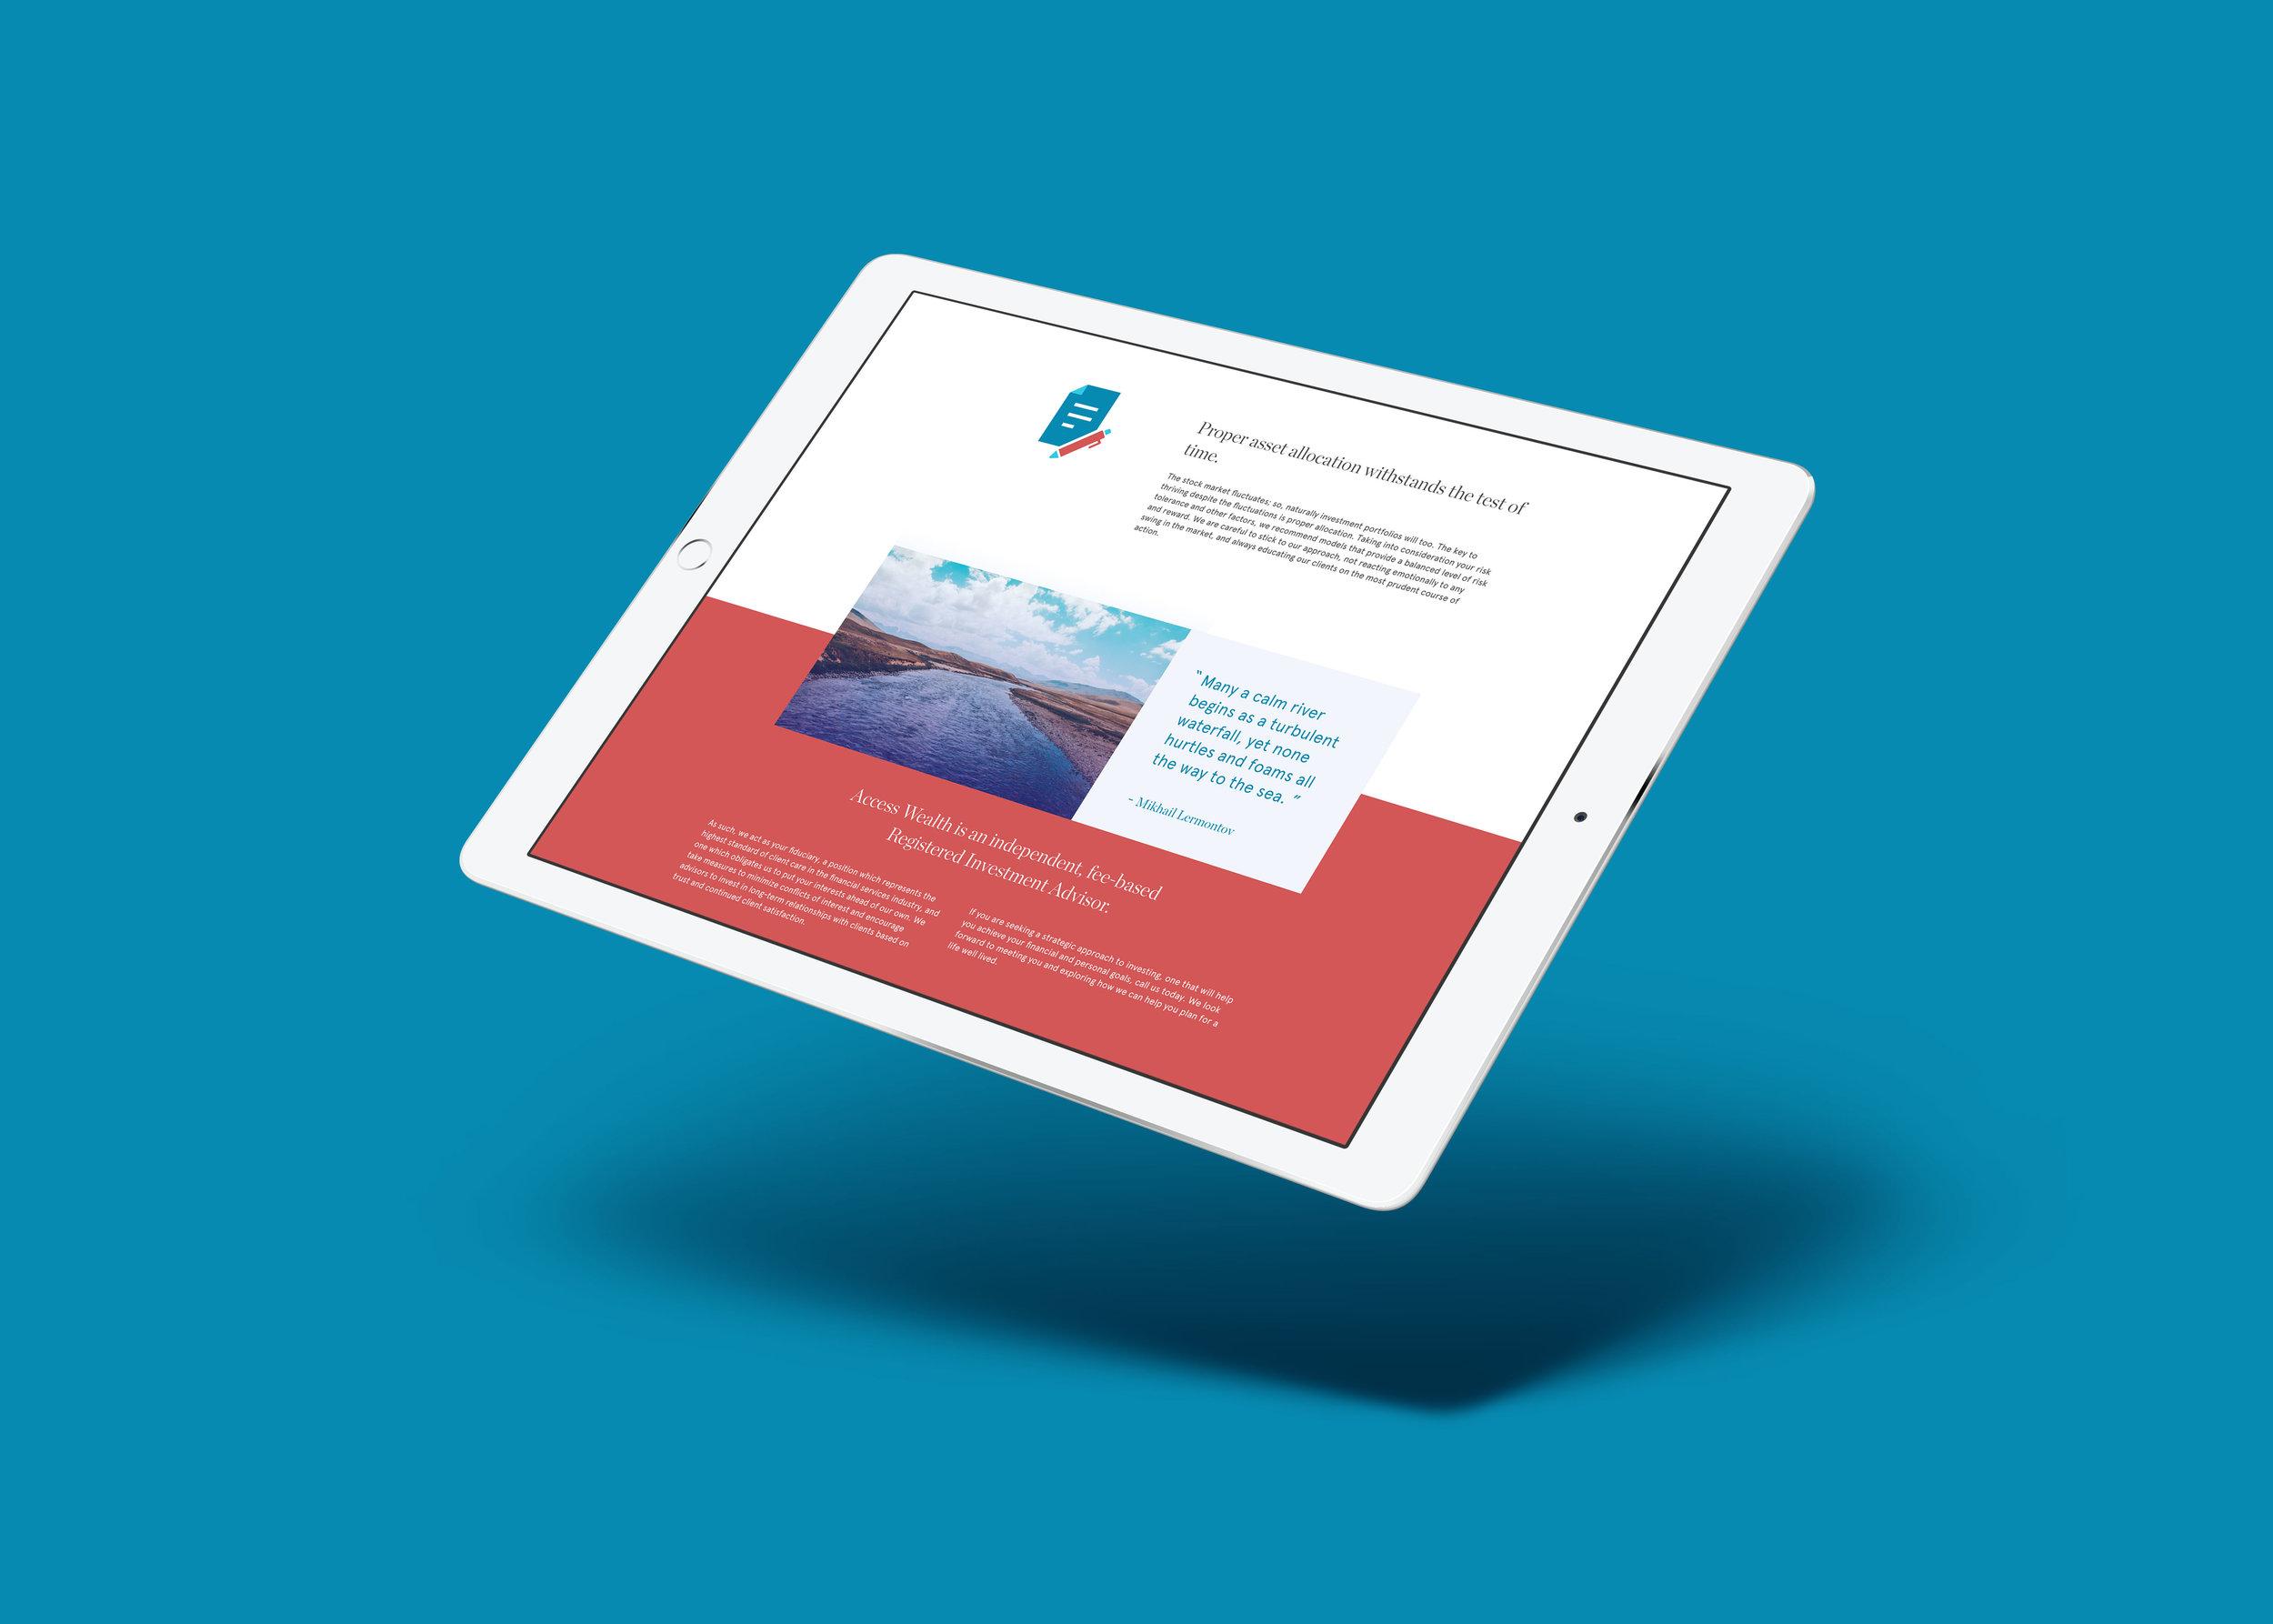 James-Rivas_Access-Wealth_Website_tablet.jpg